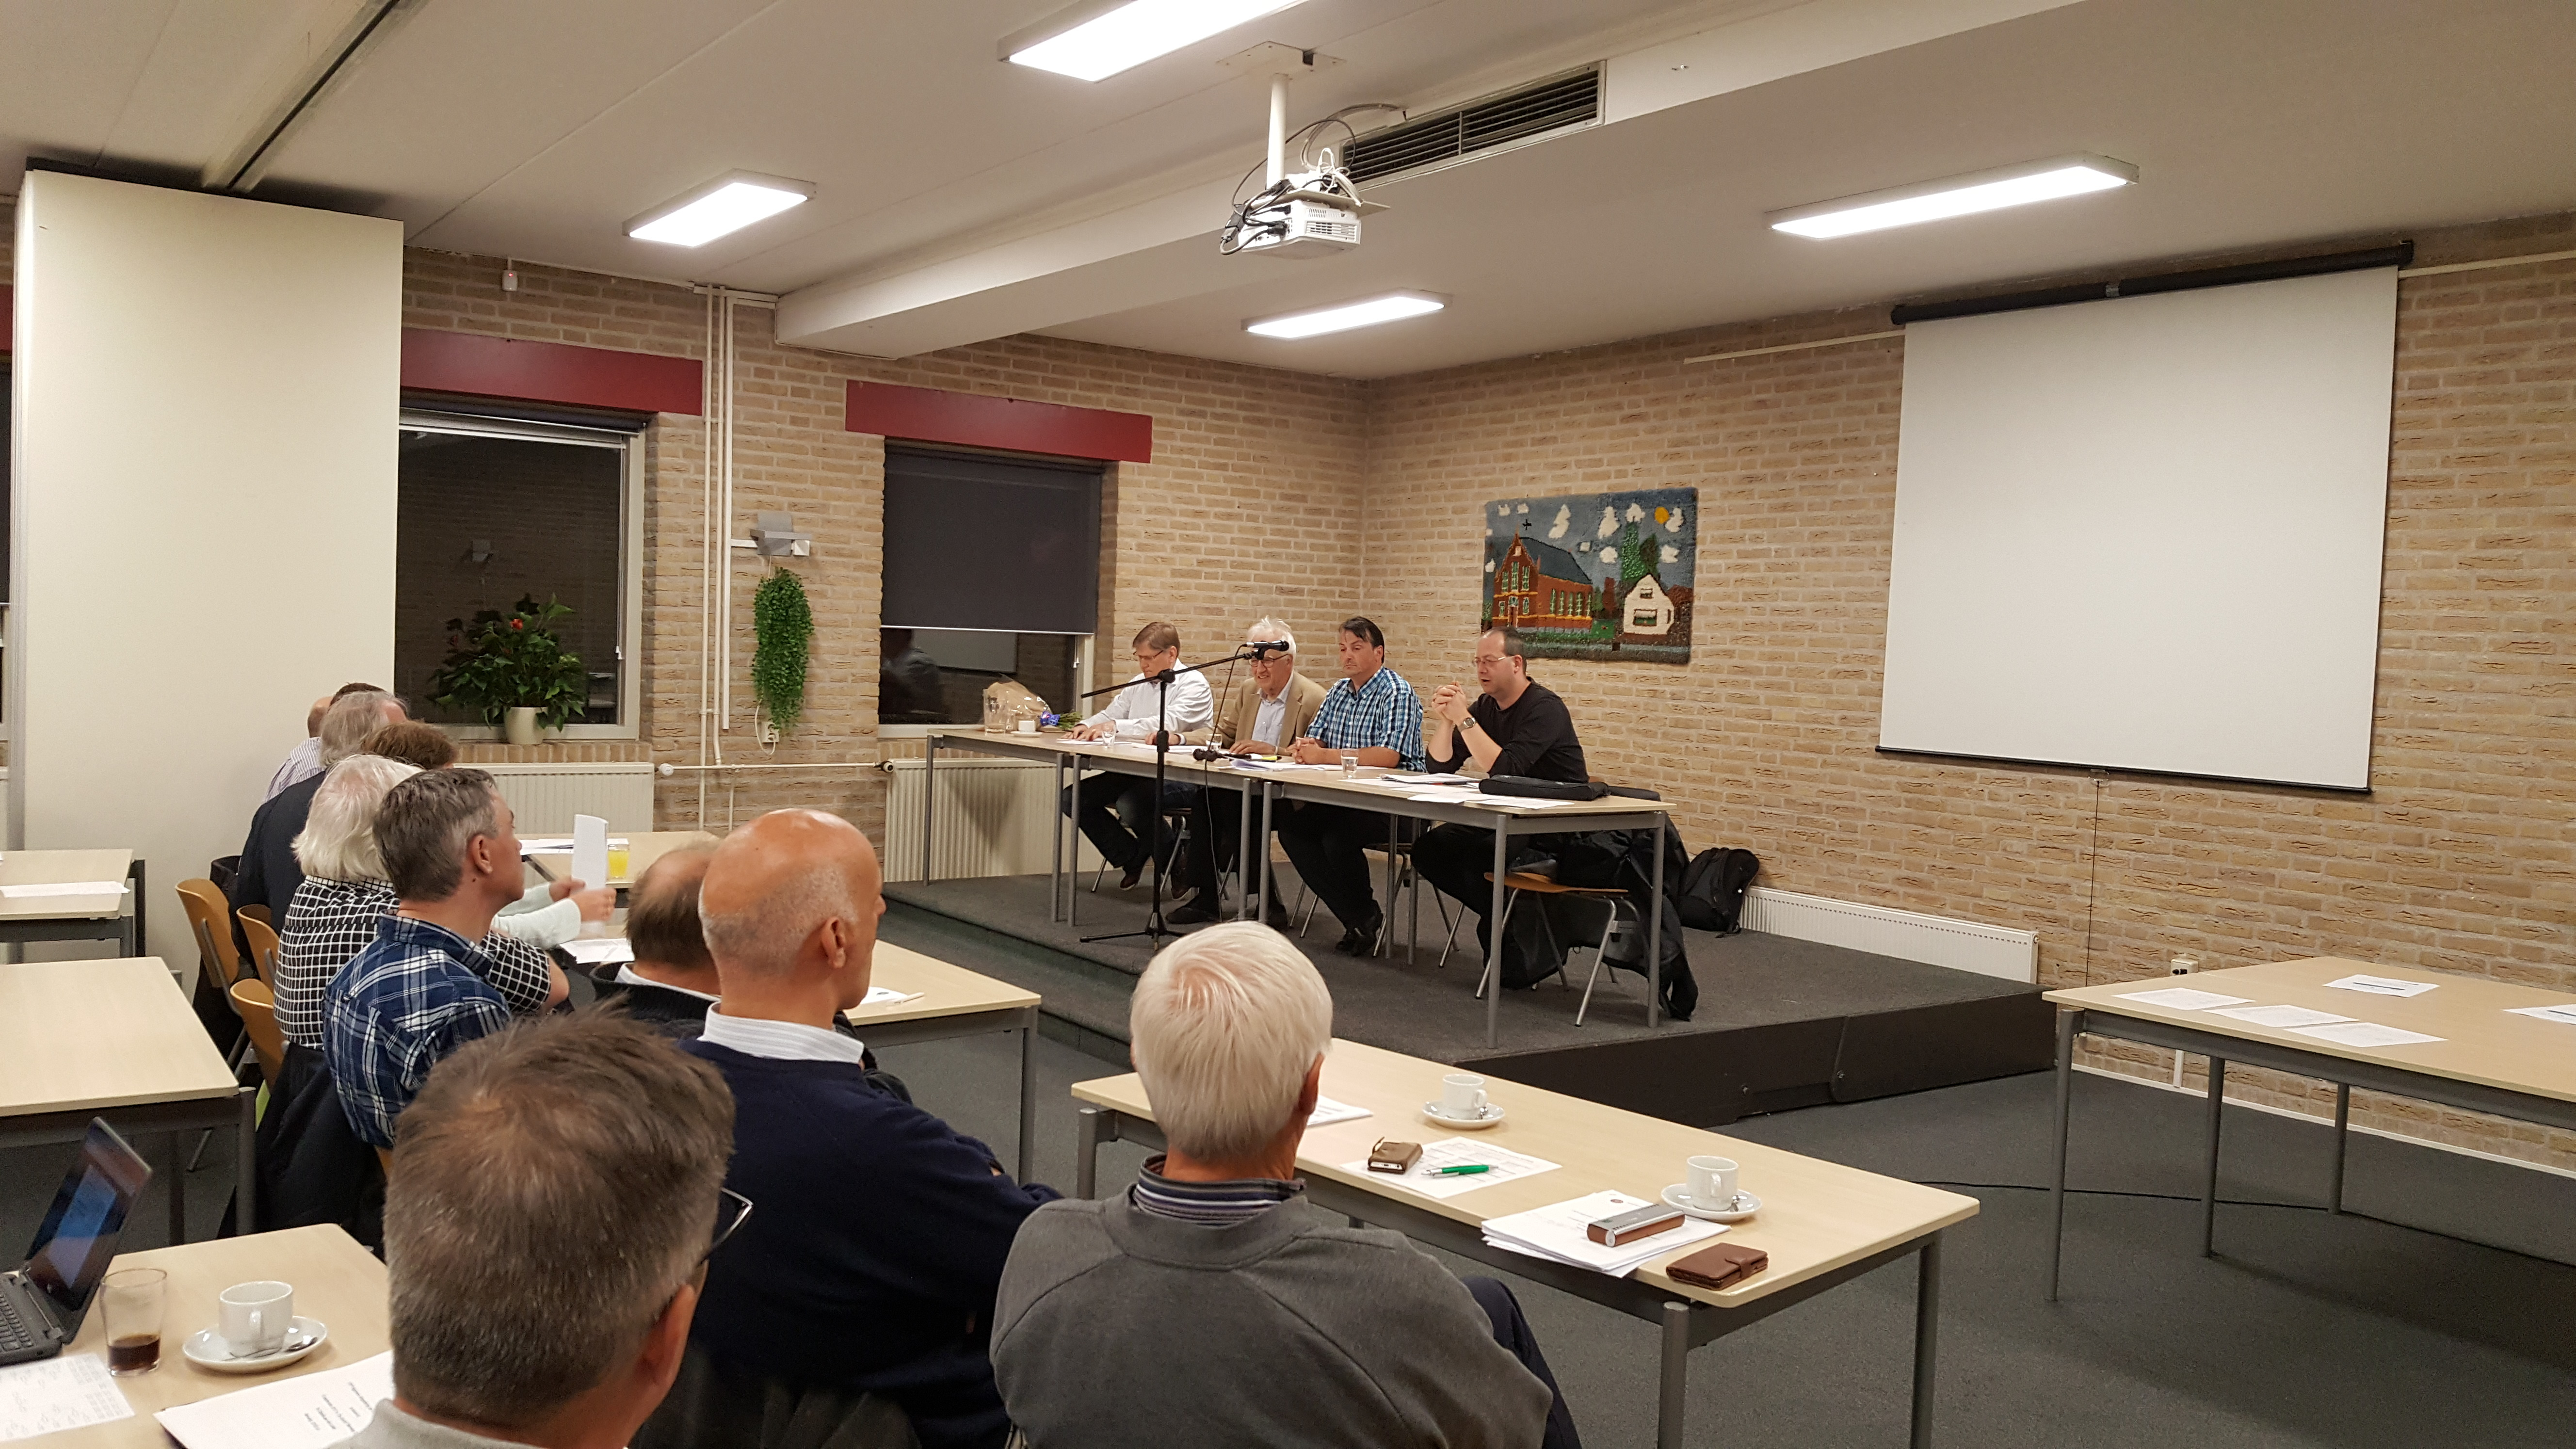 Algemene Vergadering van de RSB - 13 september 2017 (2)